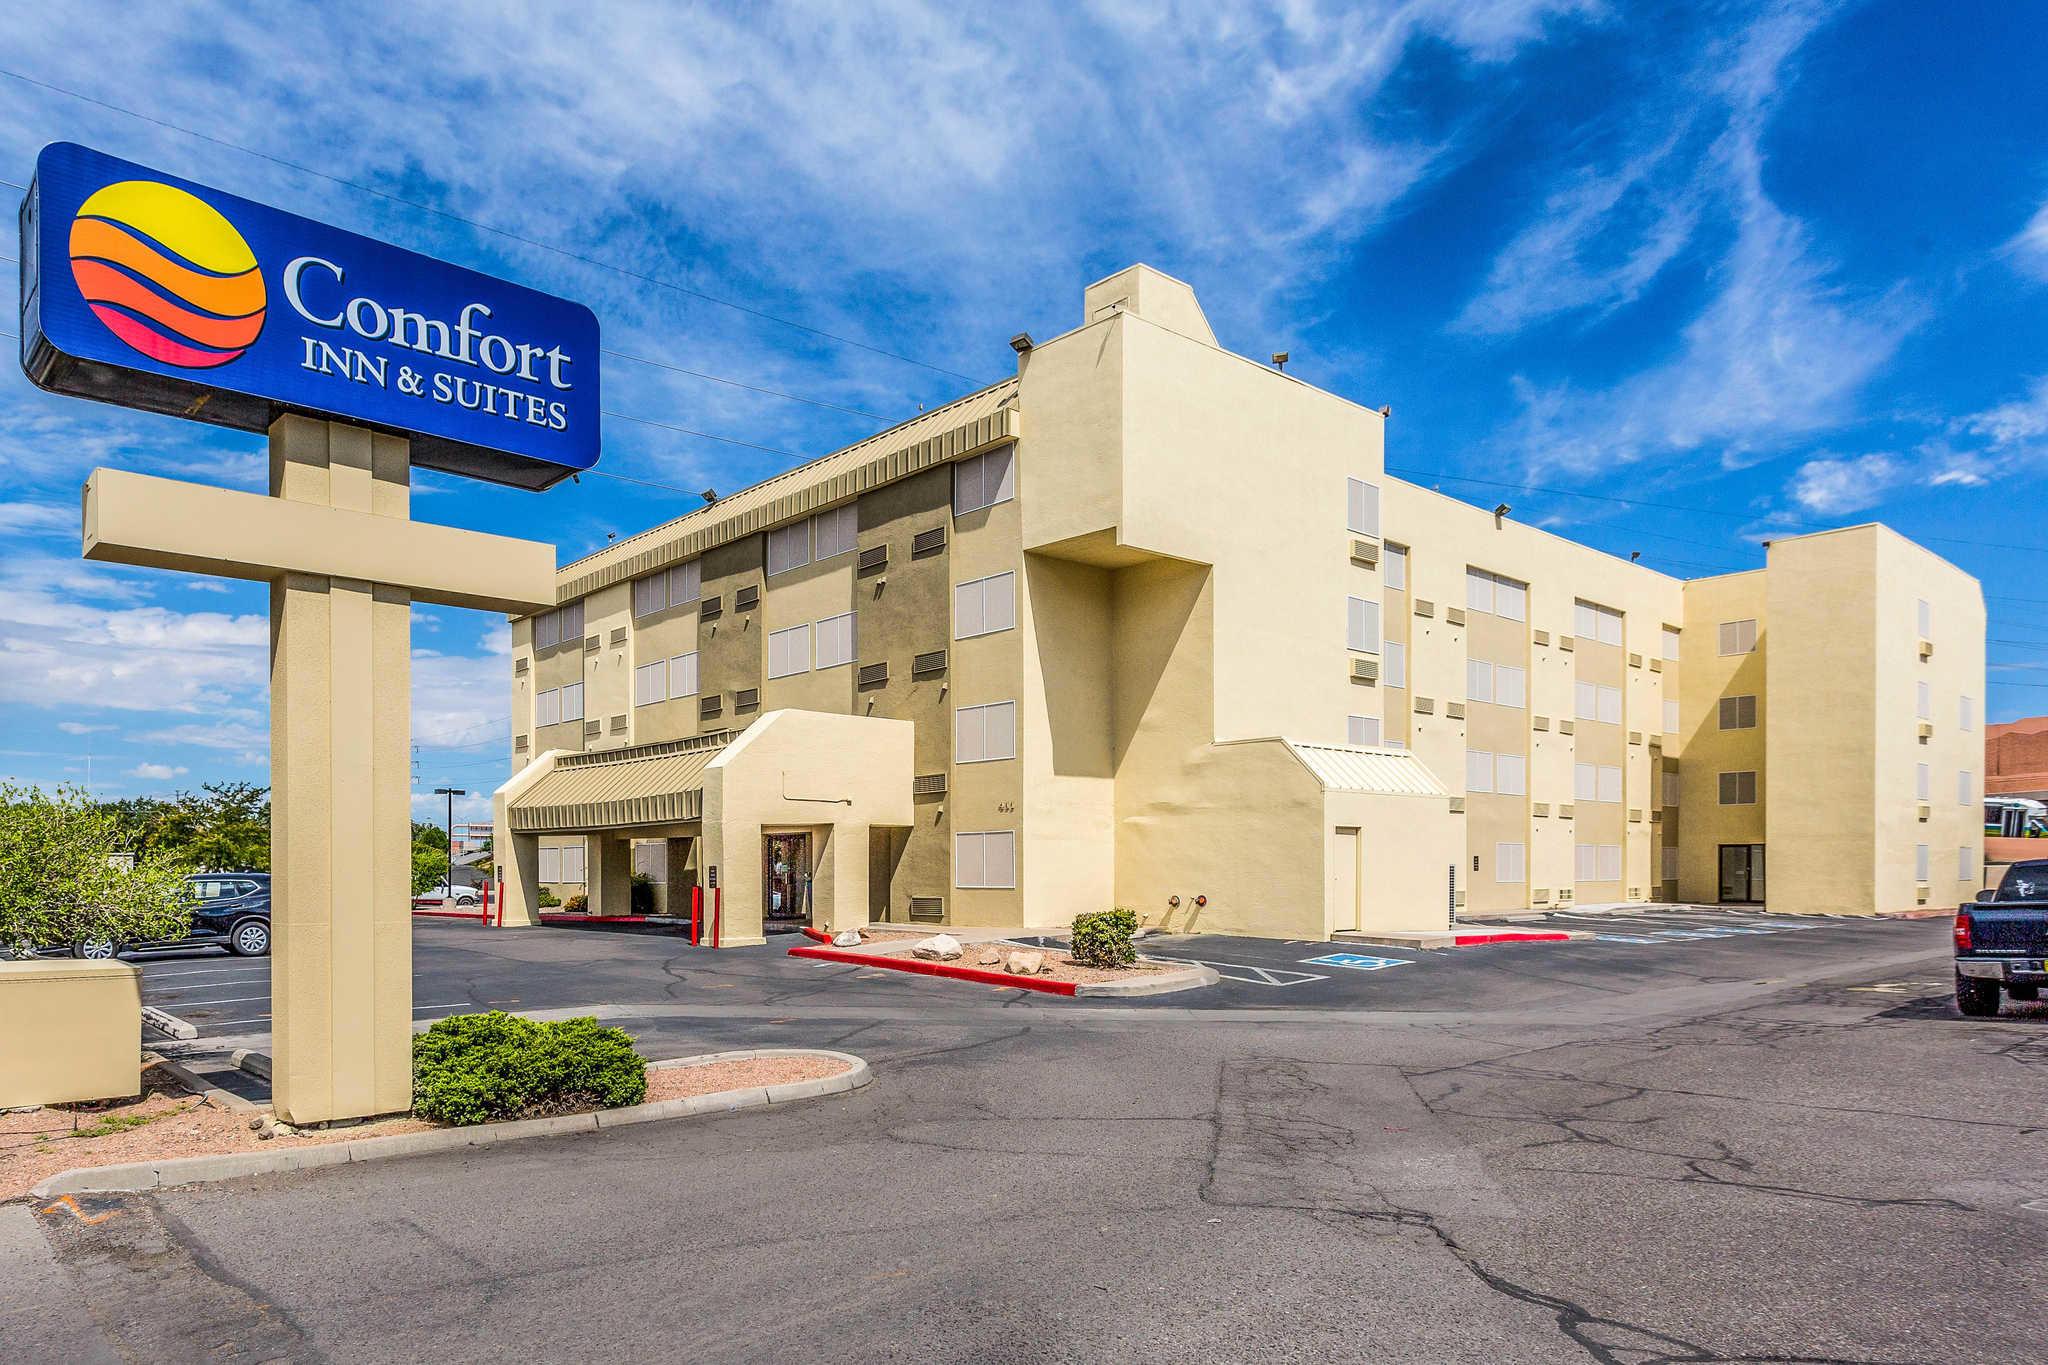 Comfort Inn & Suites Albuquerque Downtown image 1